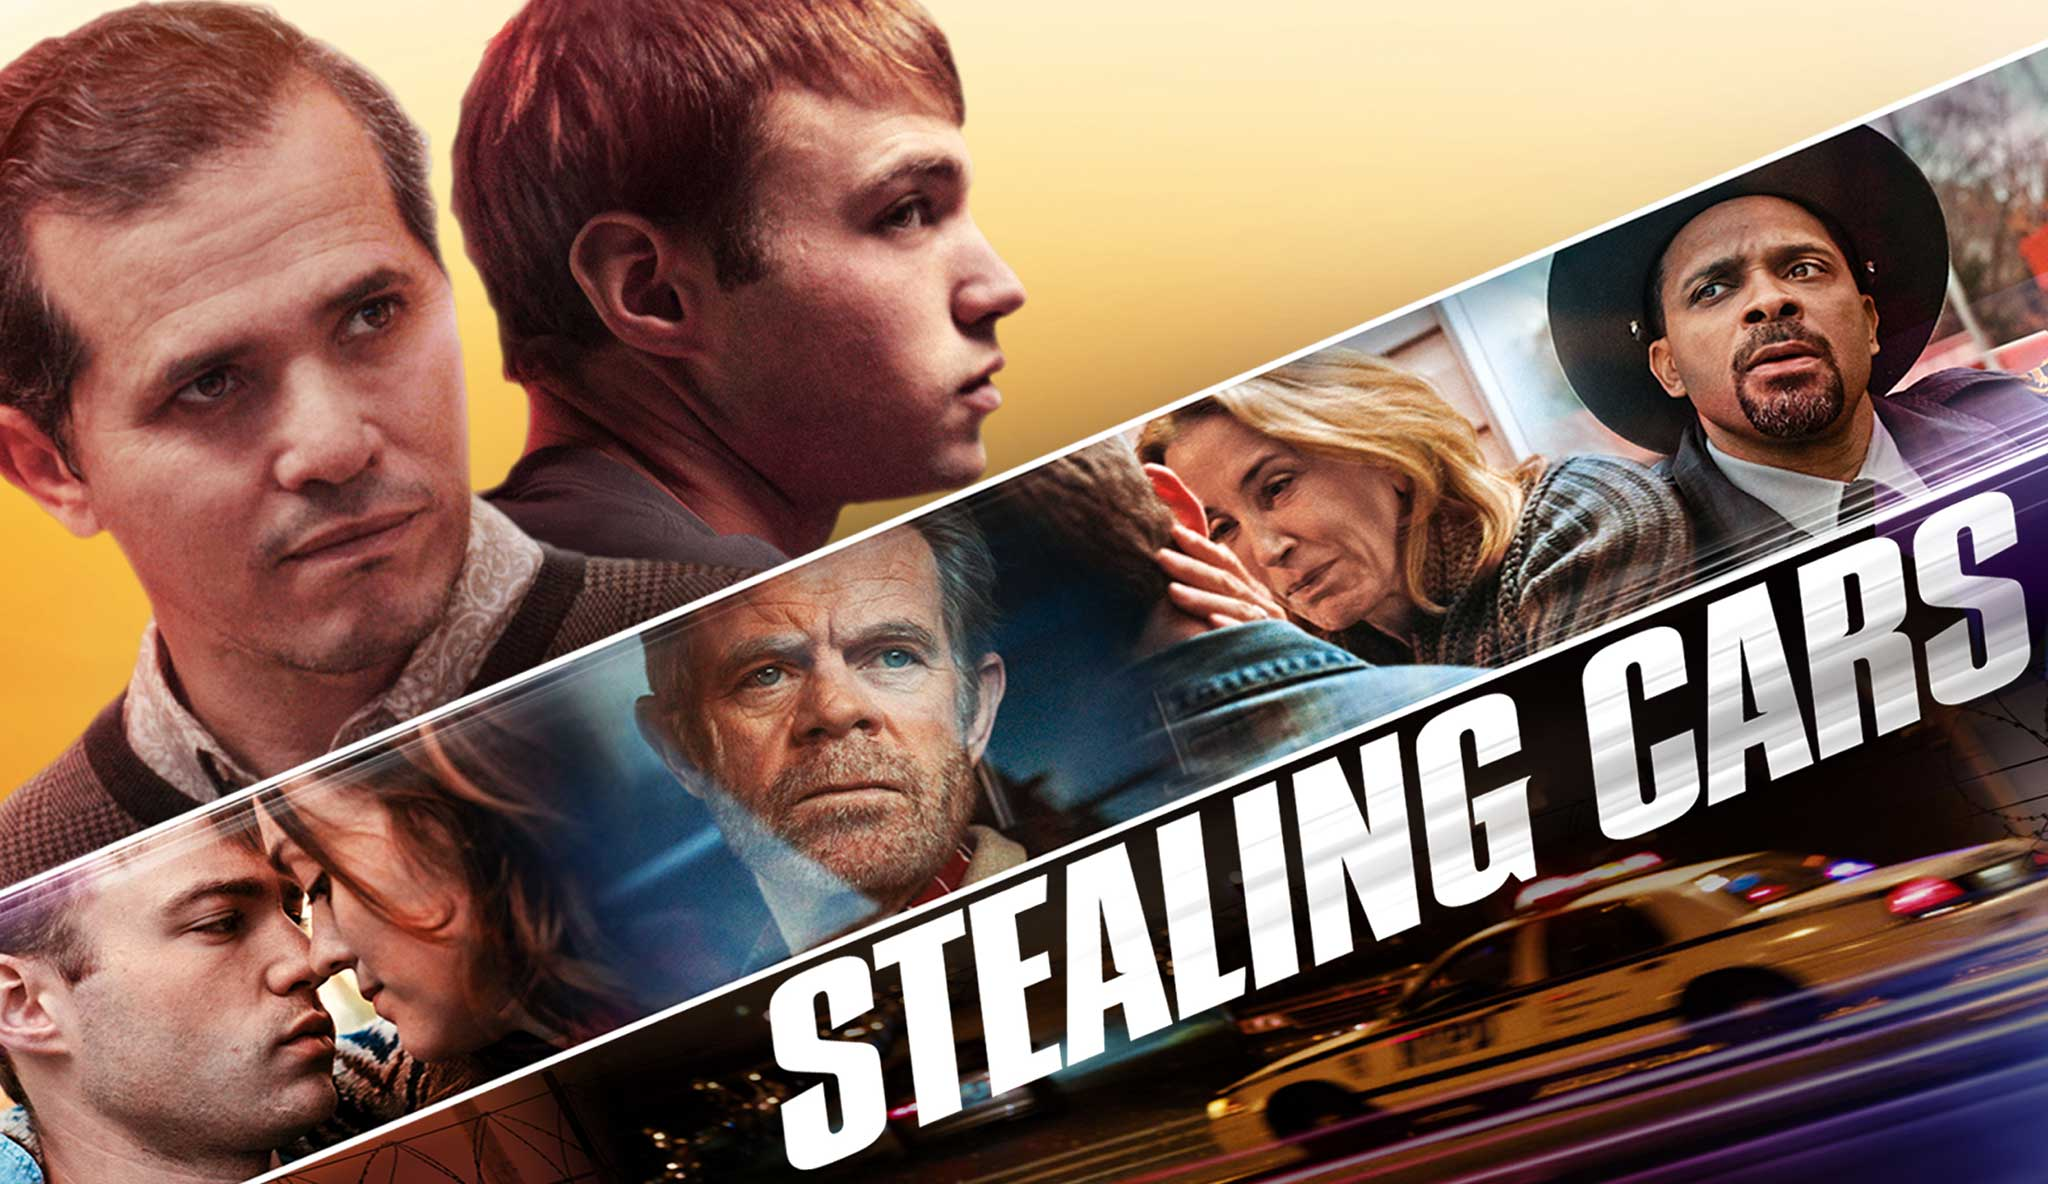 stealing-cars\header.jpg